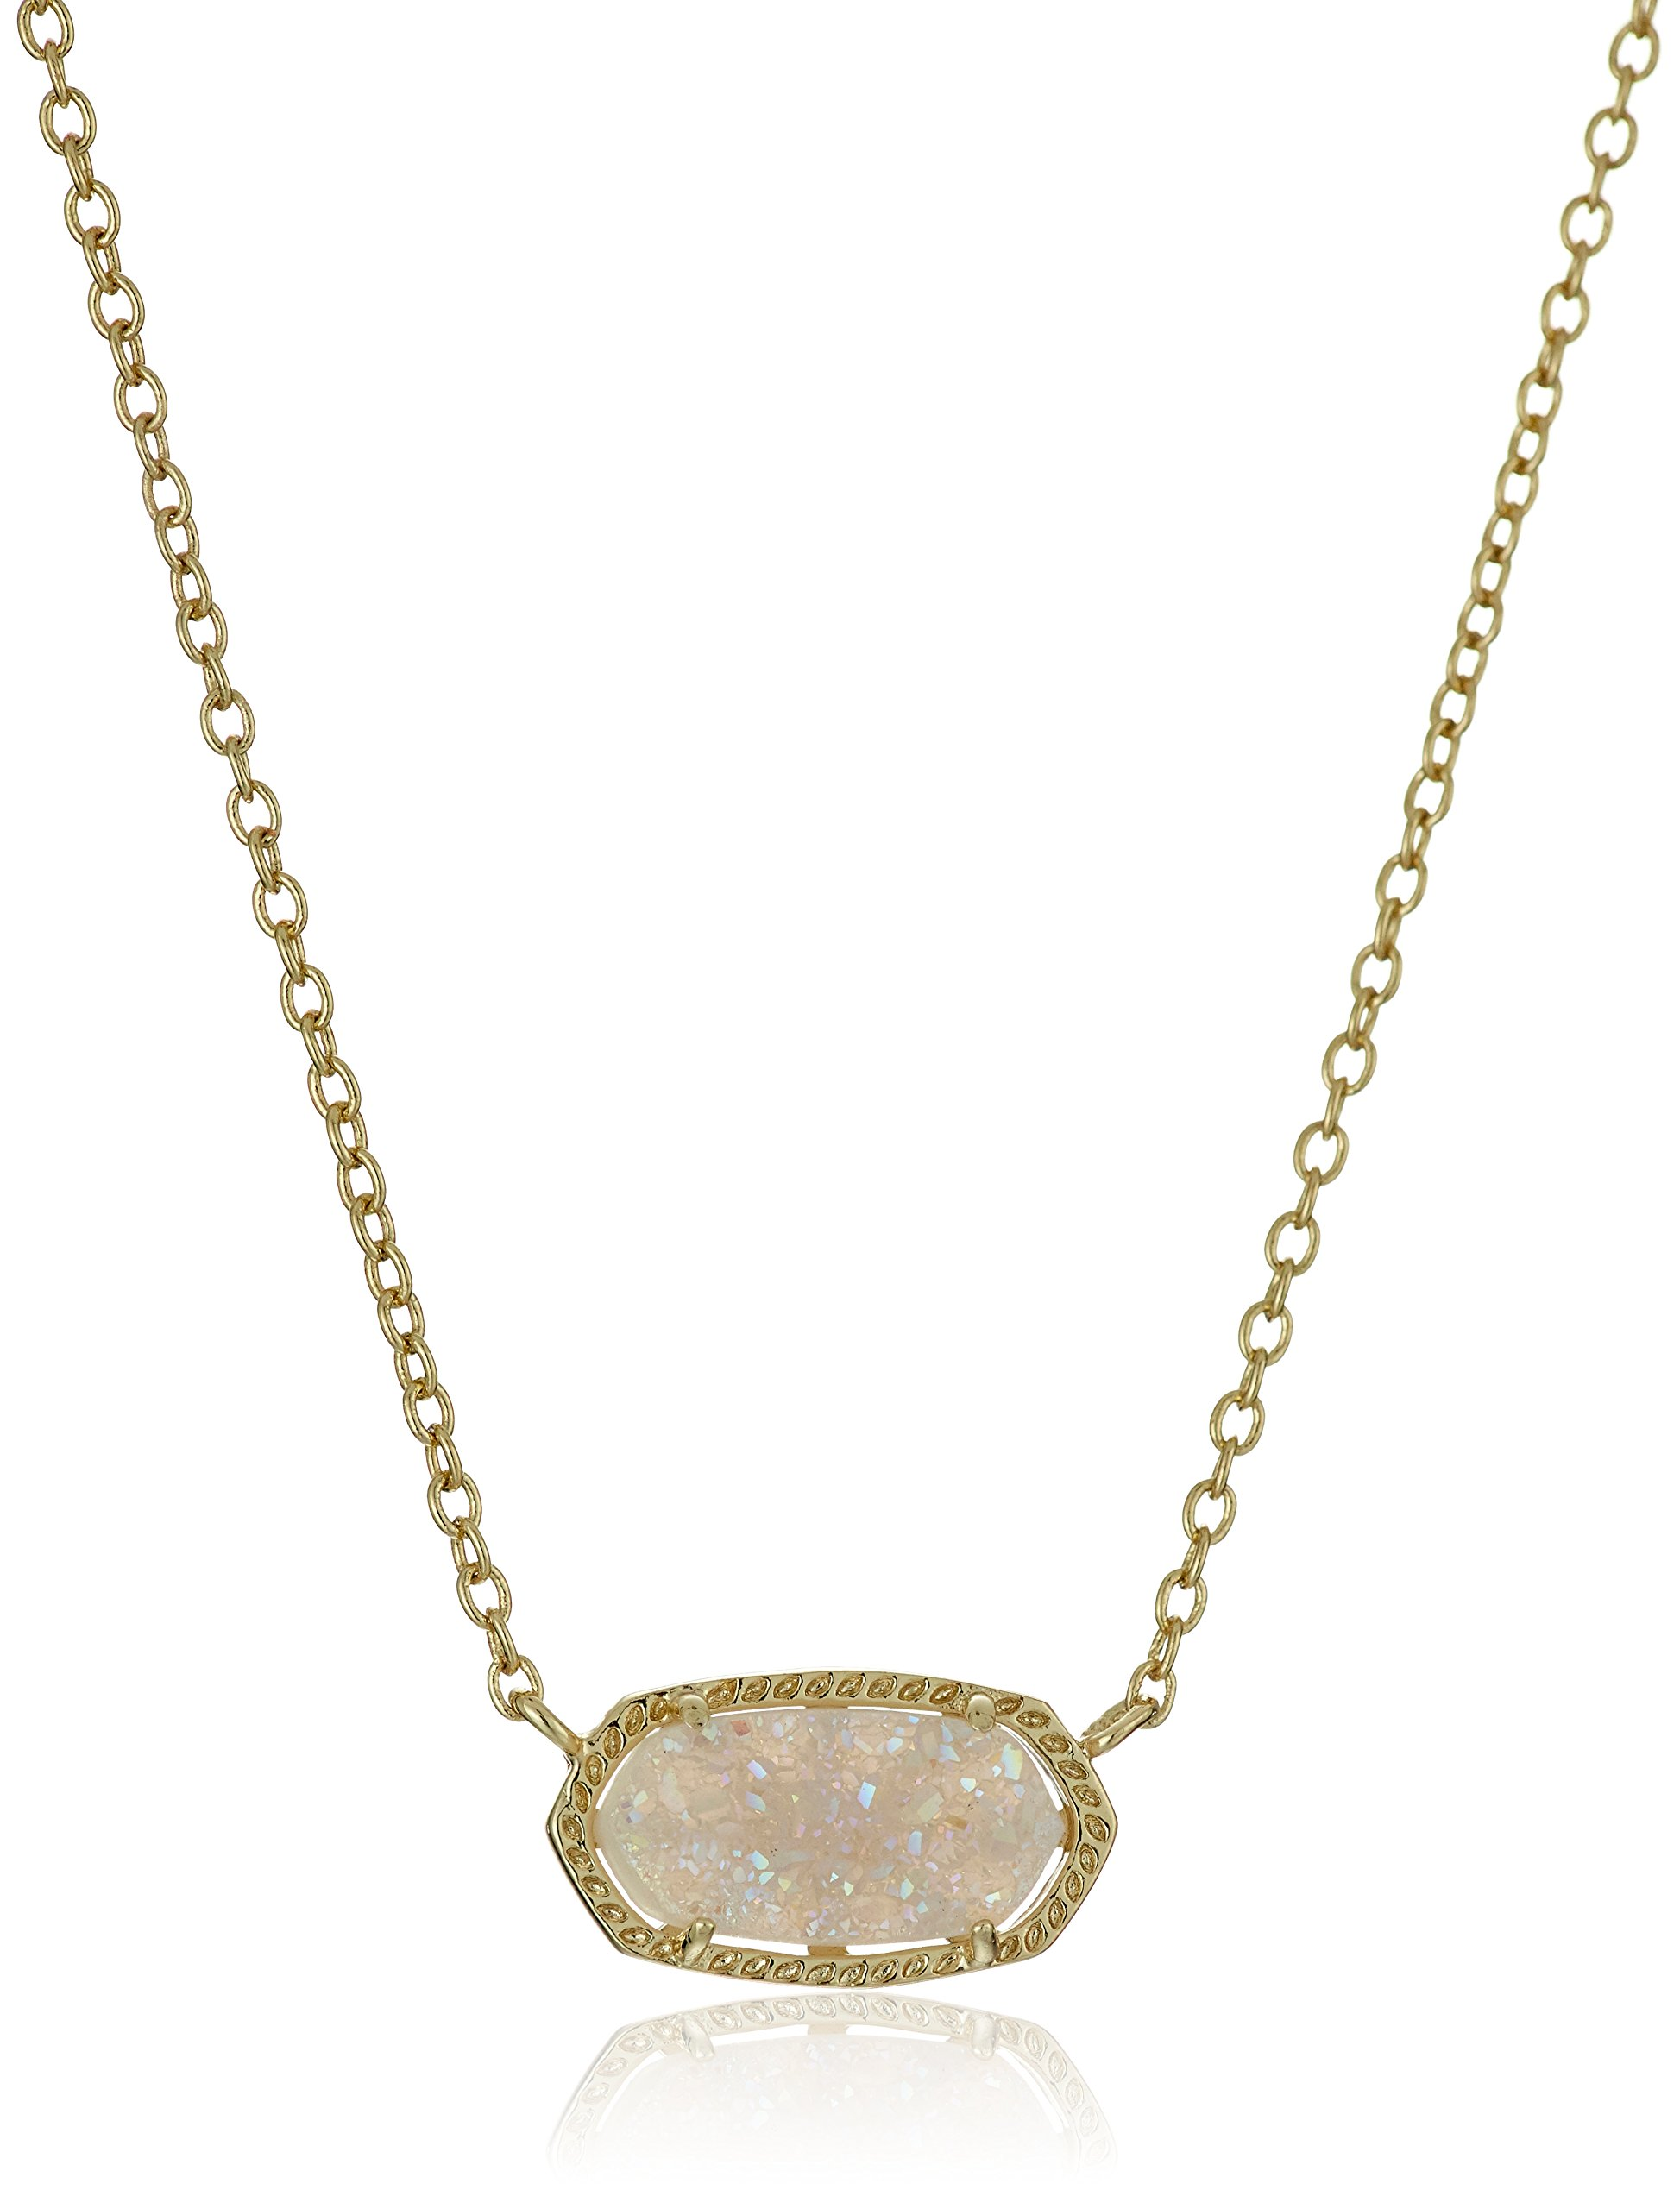 Kendra Scott ''Signature'' Elisa Gold plated Iridescent Druzy Pendant Necklace